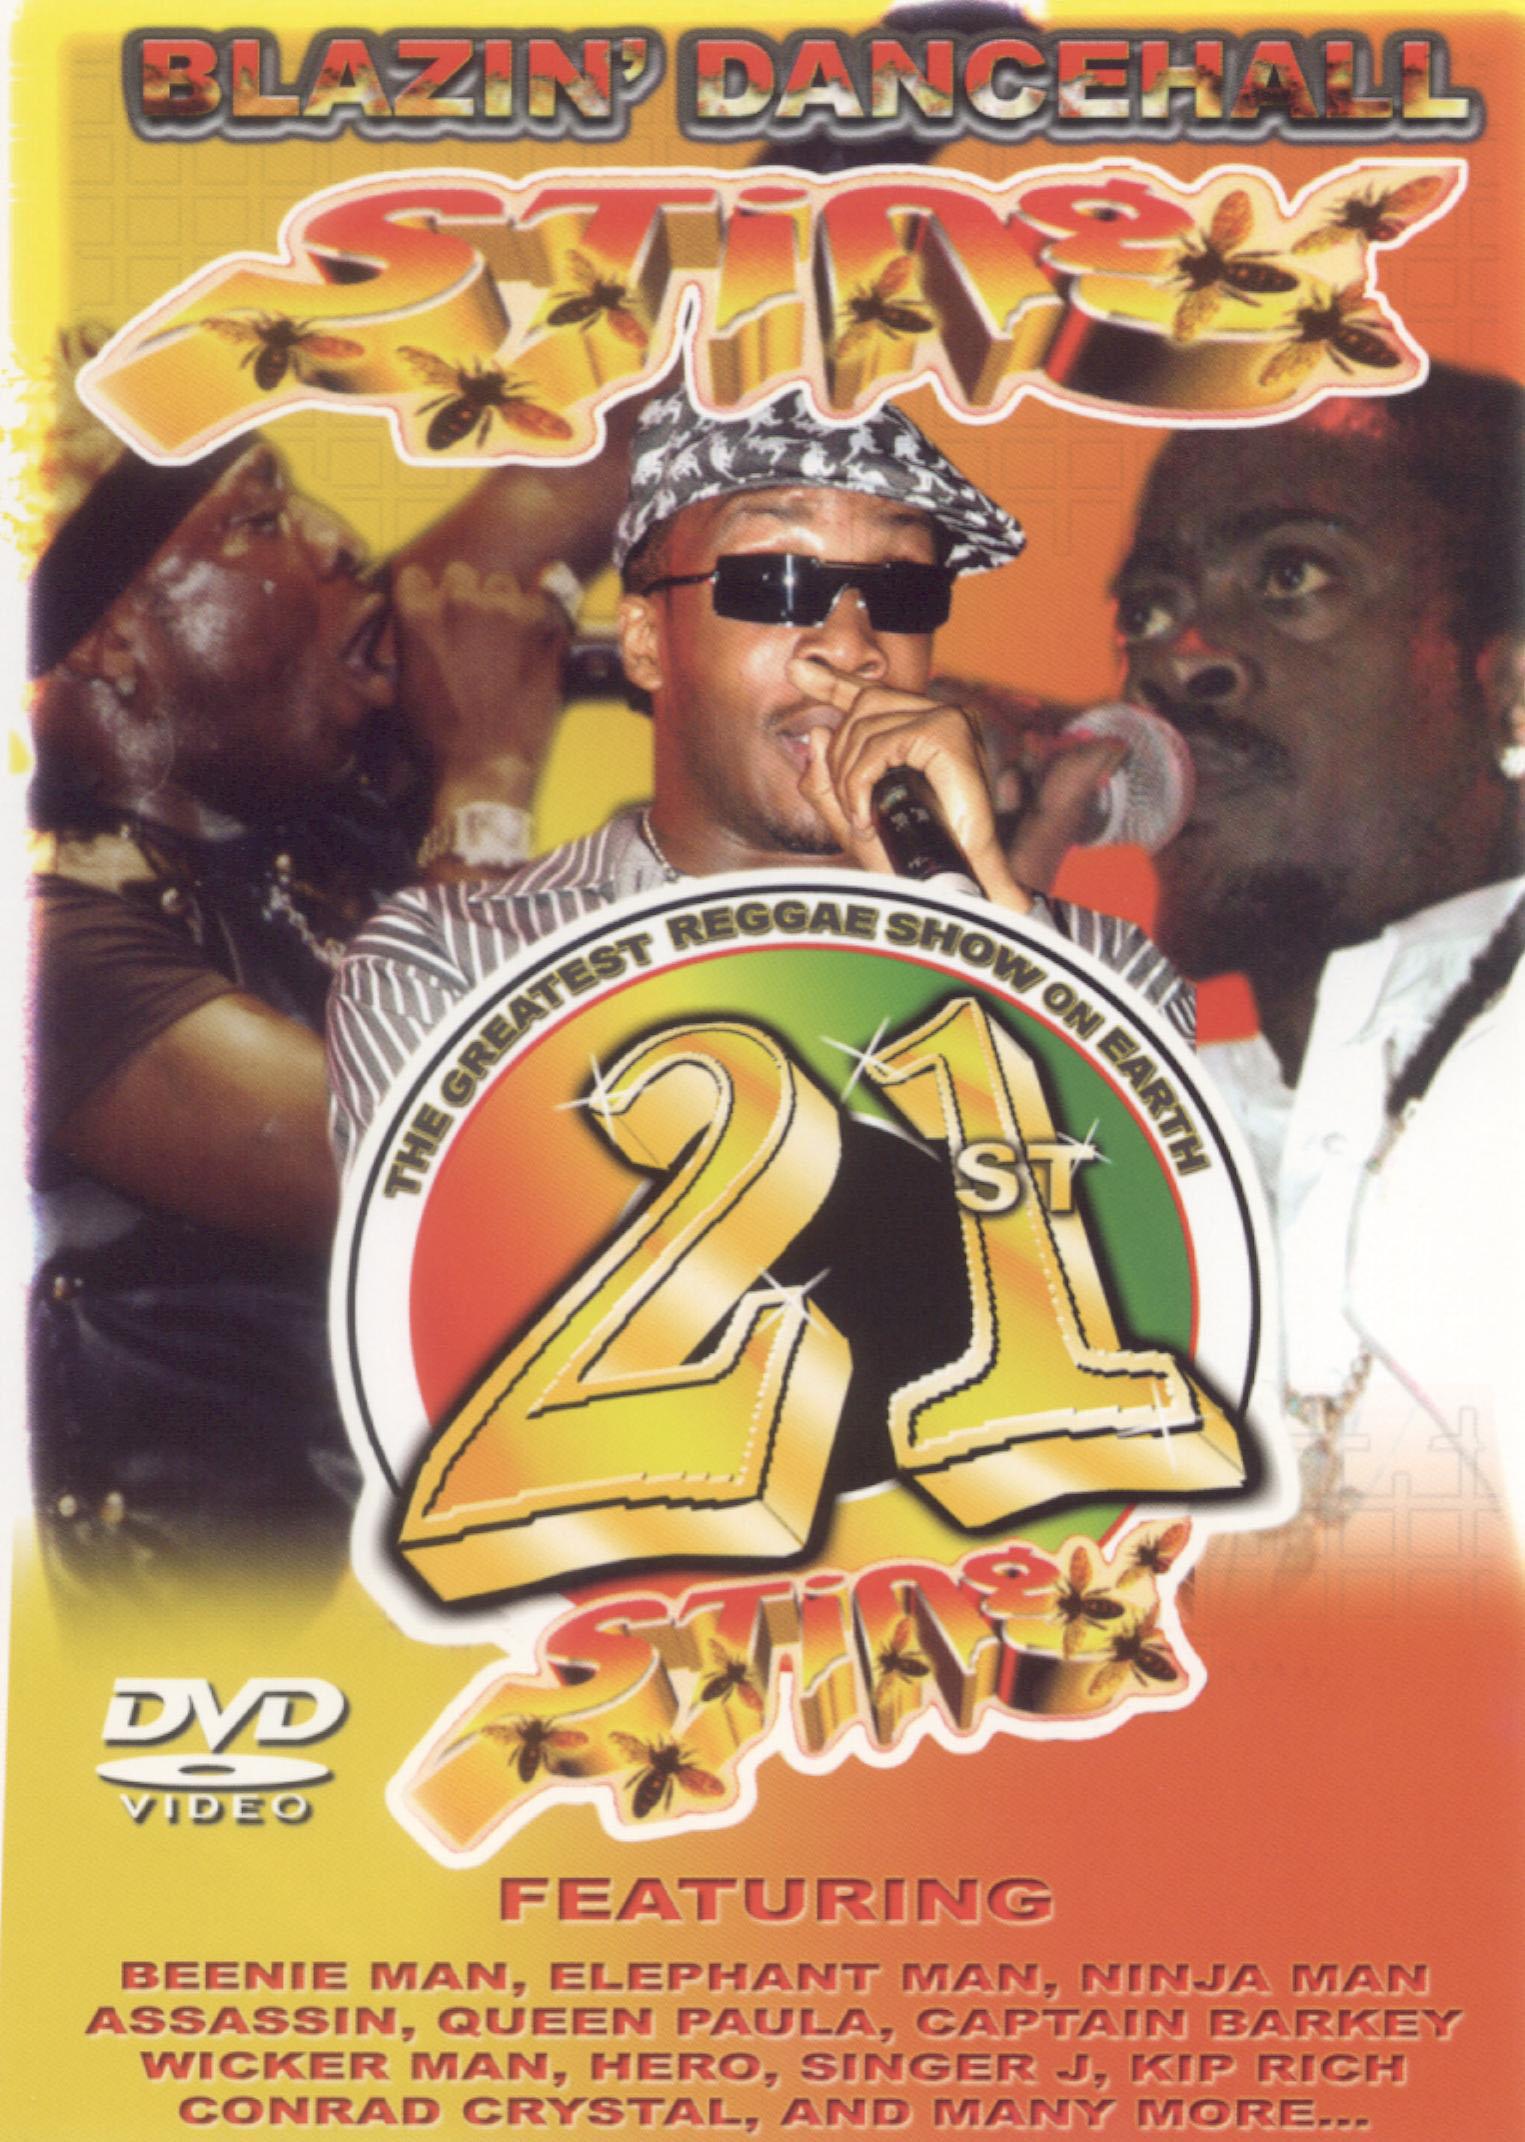 Sting 21: Blazin' Dancehall